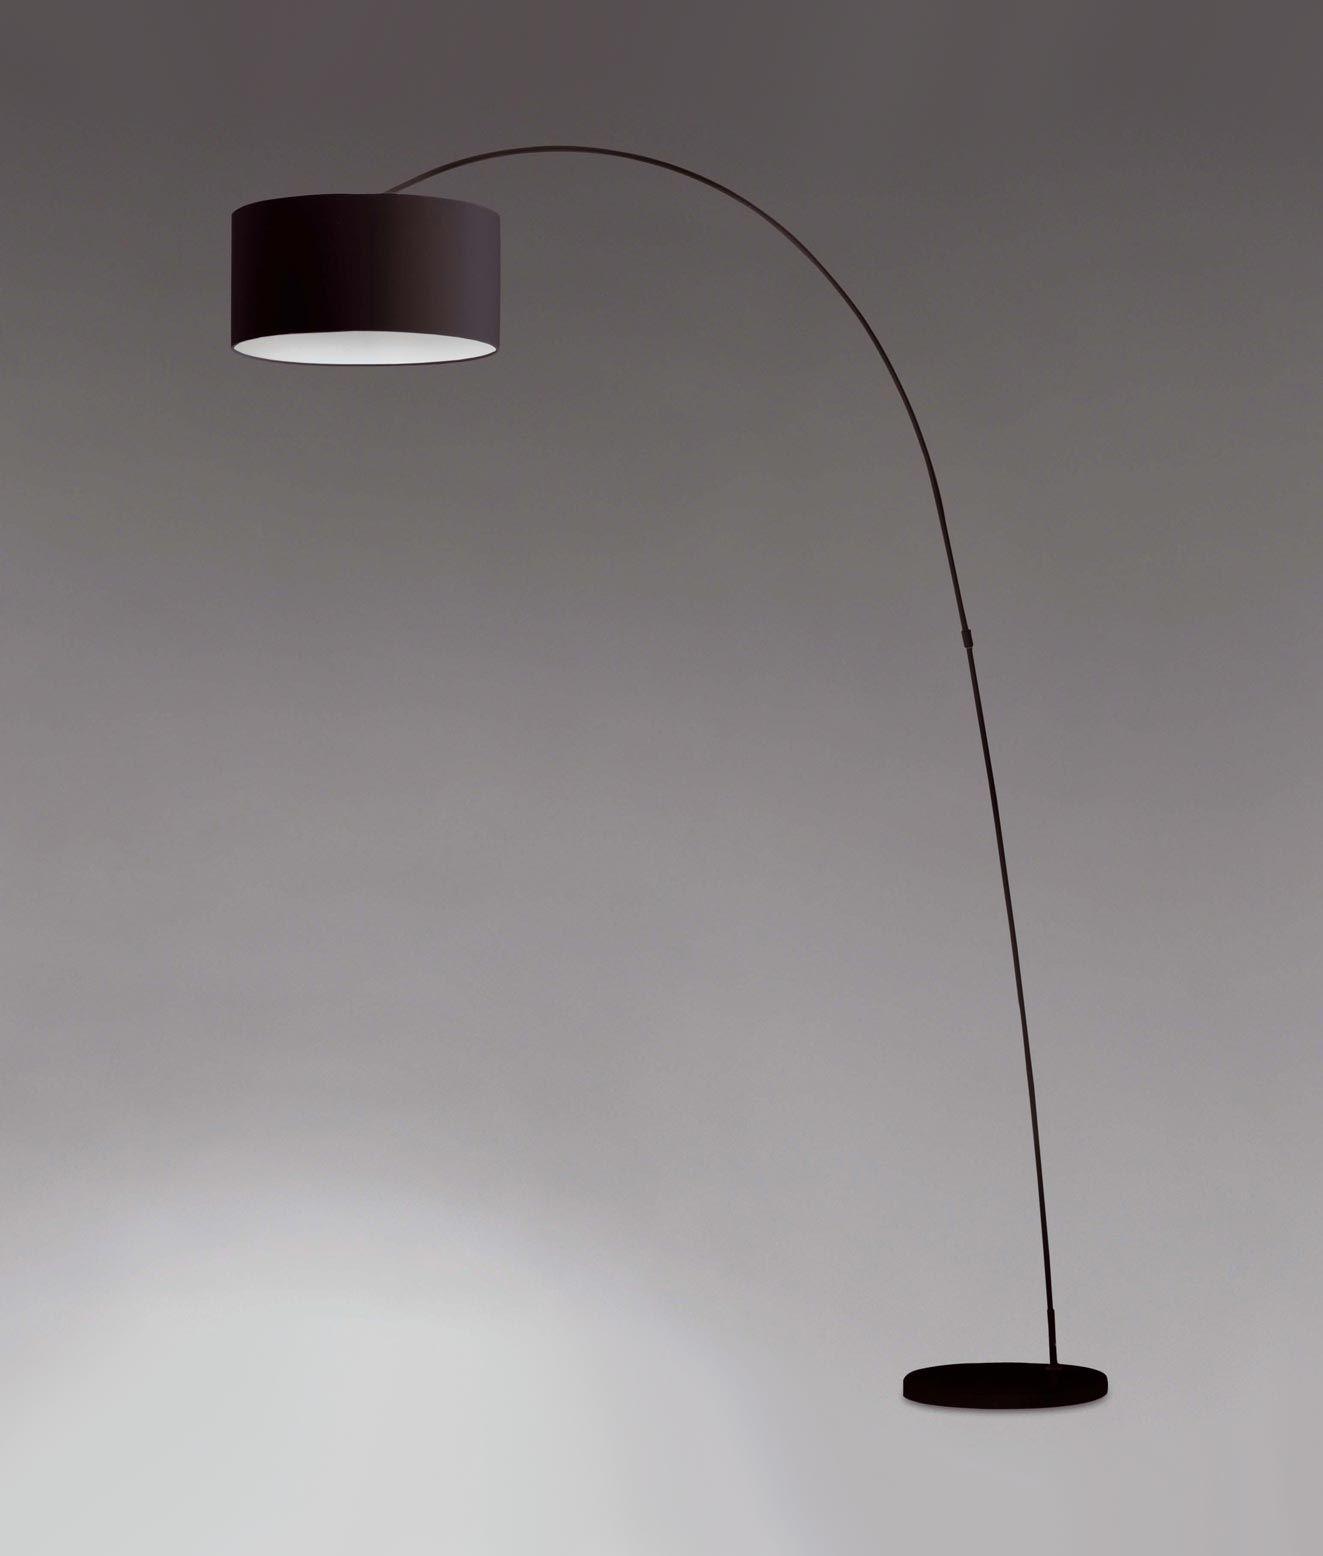 L mpara de pie negra papua iluminaci n interior ideas - Iluminacion de pie ...